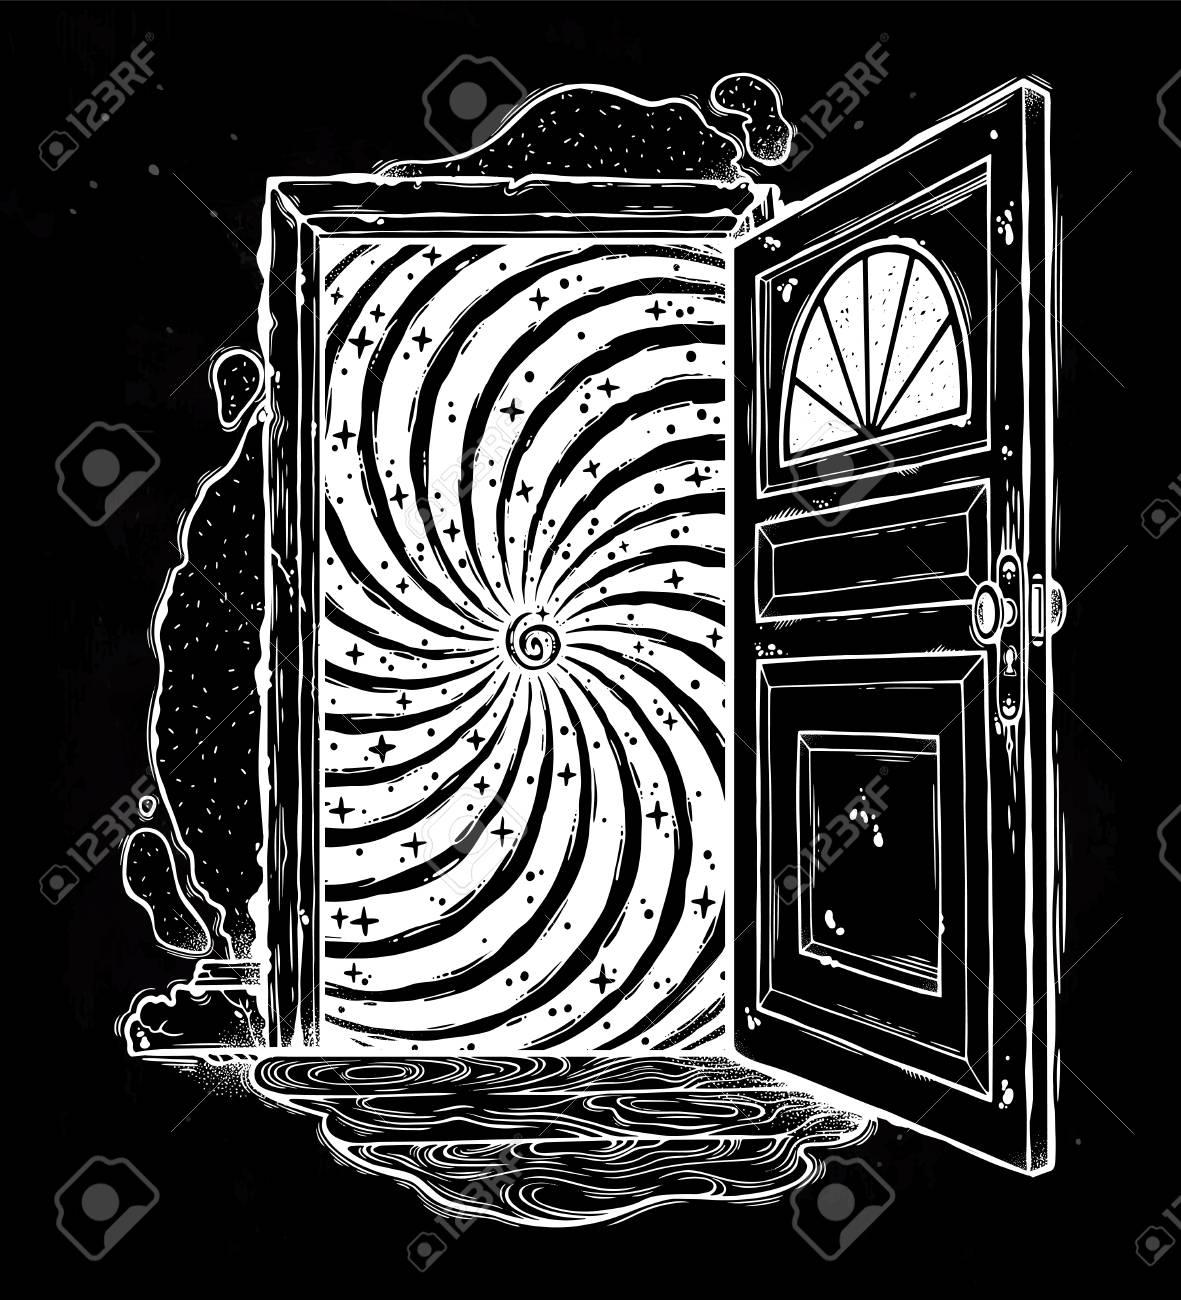 Open door with spiral sparkling illusion design on black background Stock Vector - 98946957  sc 1 st  123RF.com & Open Door With Spiral Sparkling Illusion Design On Black Background ...